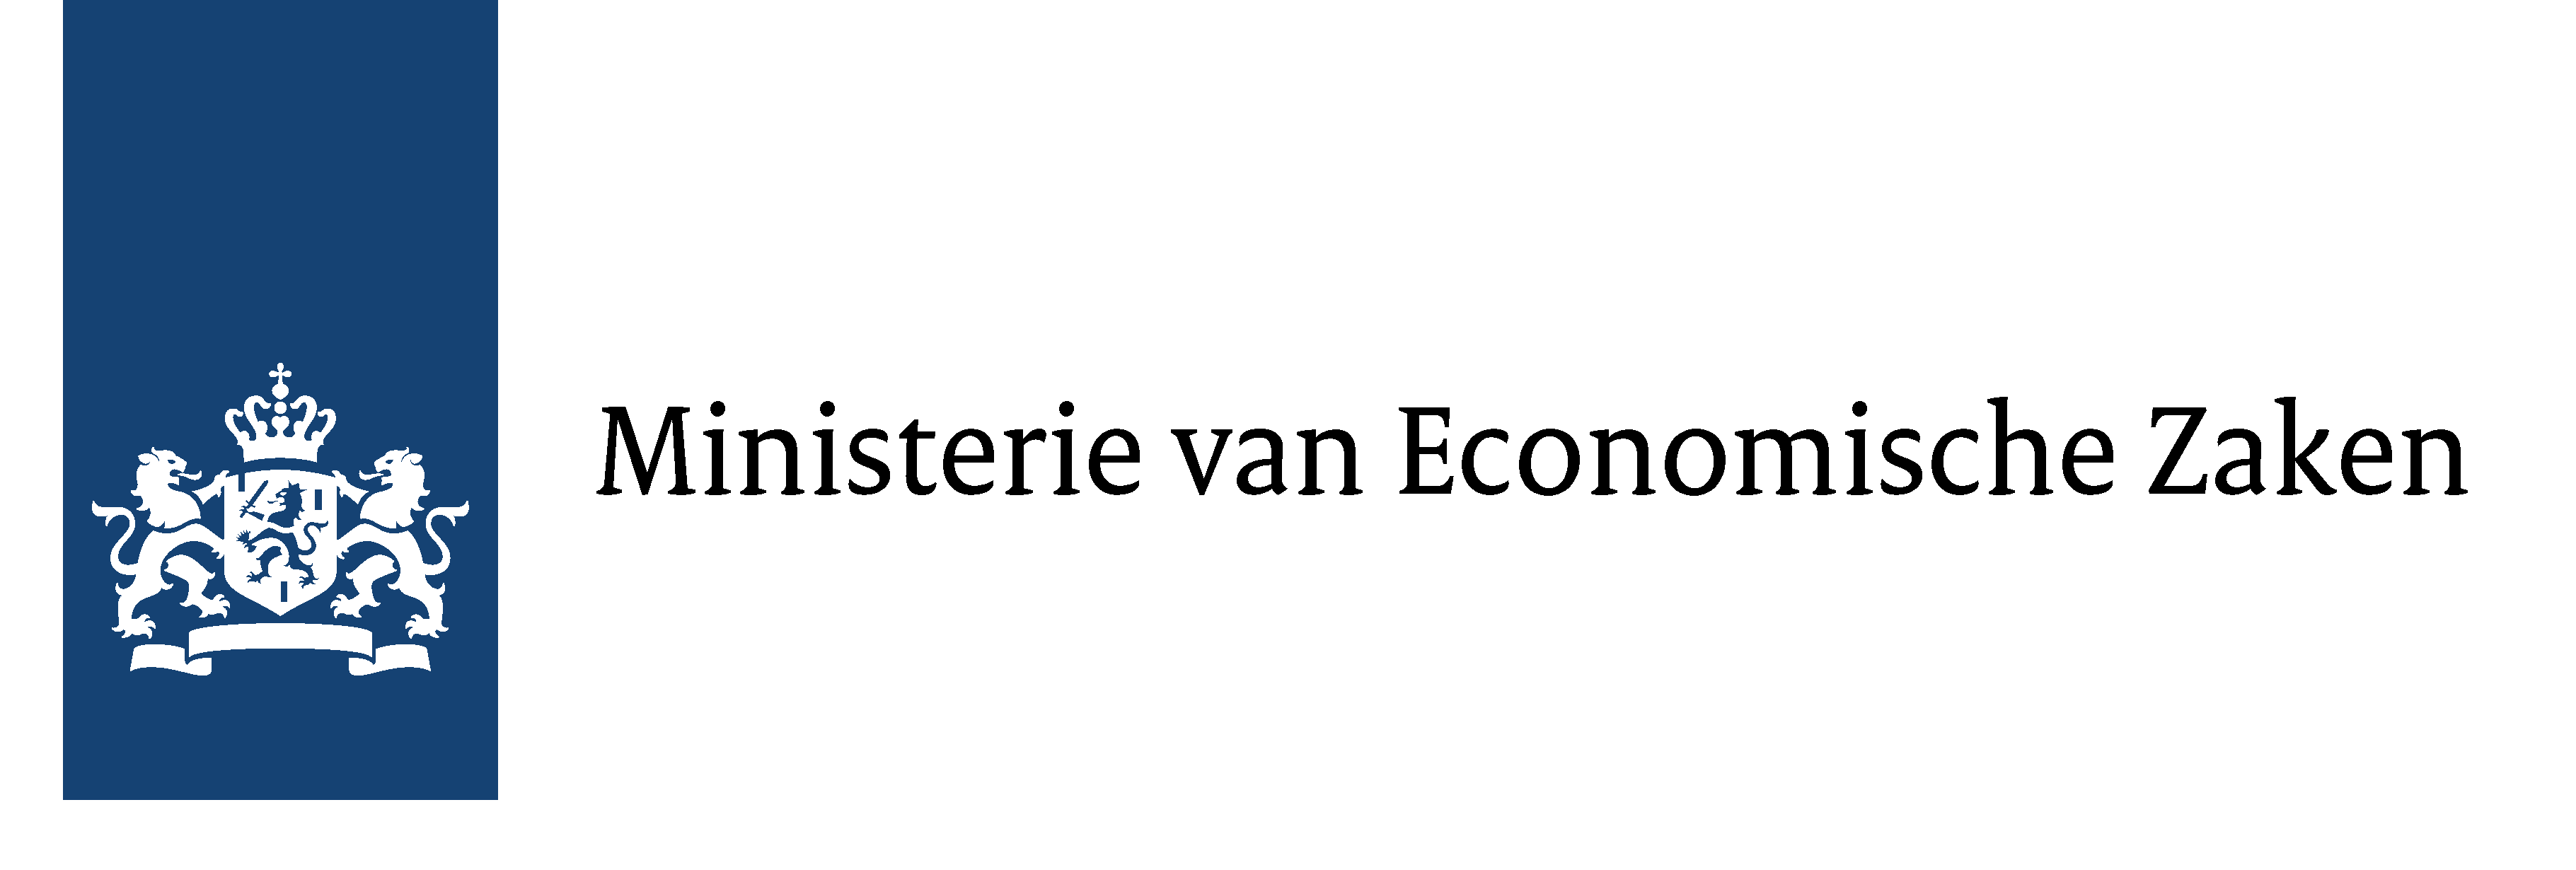 min logo